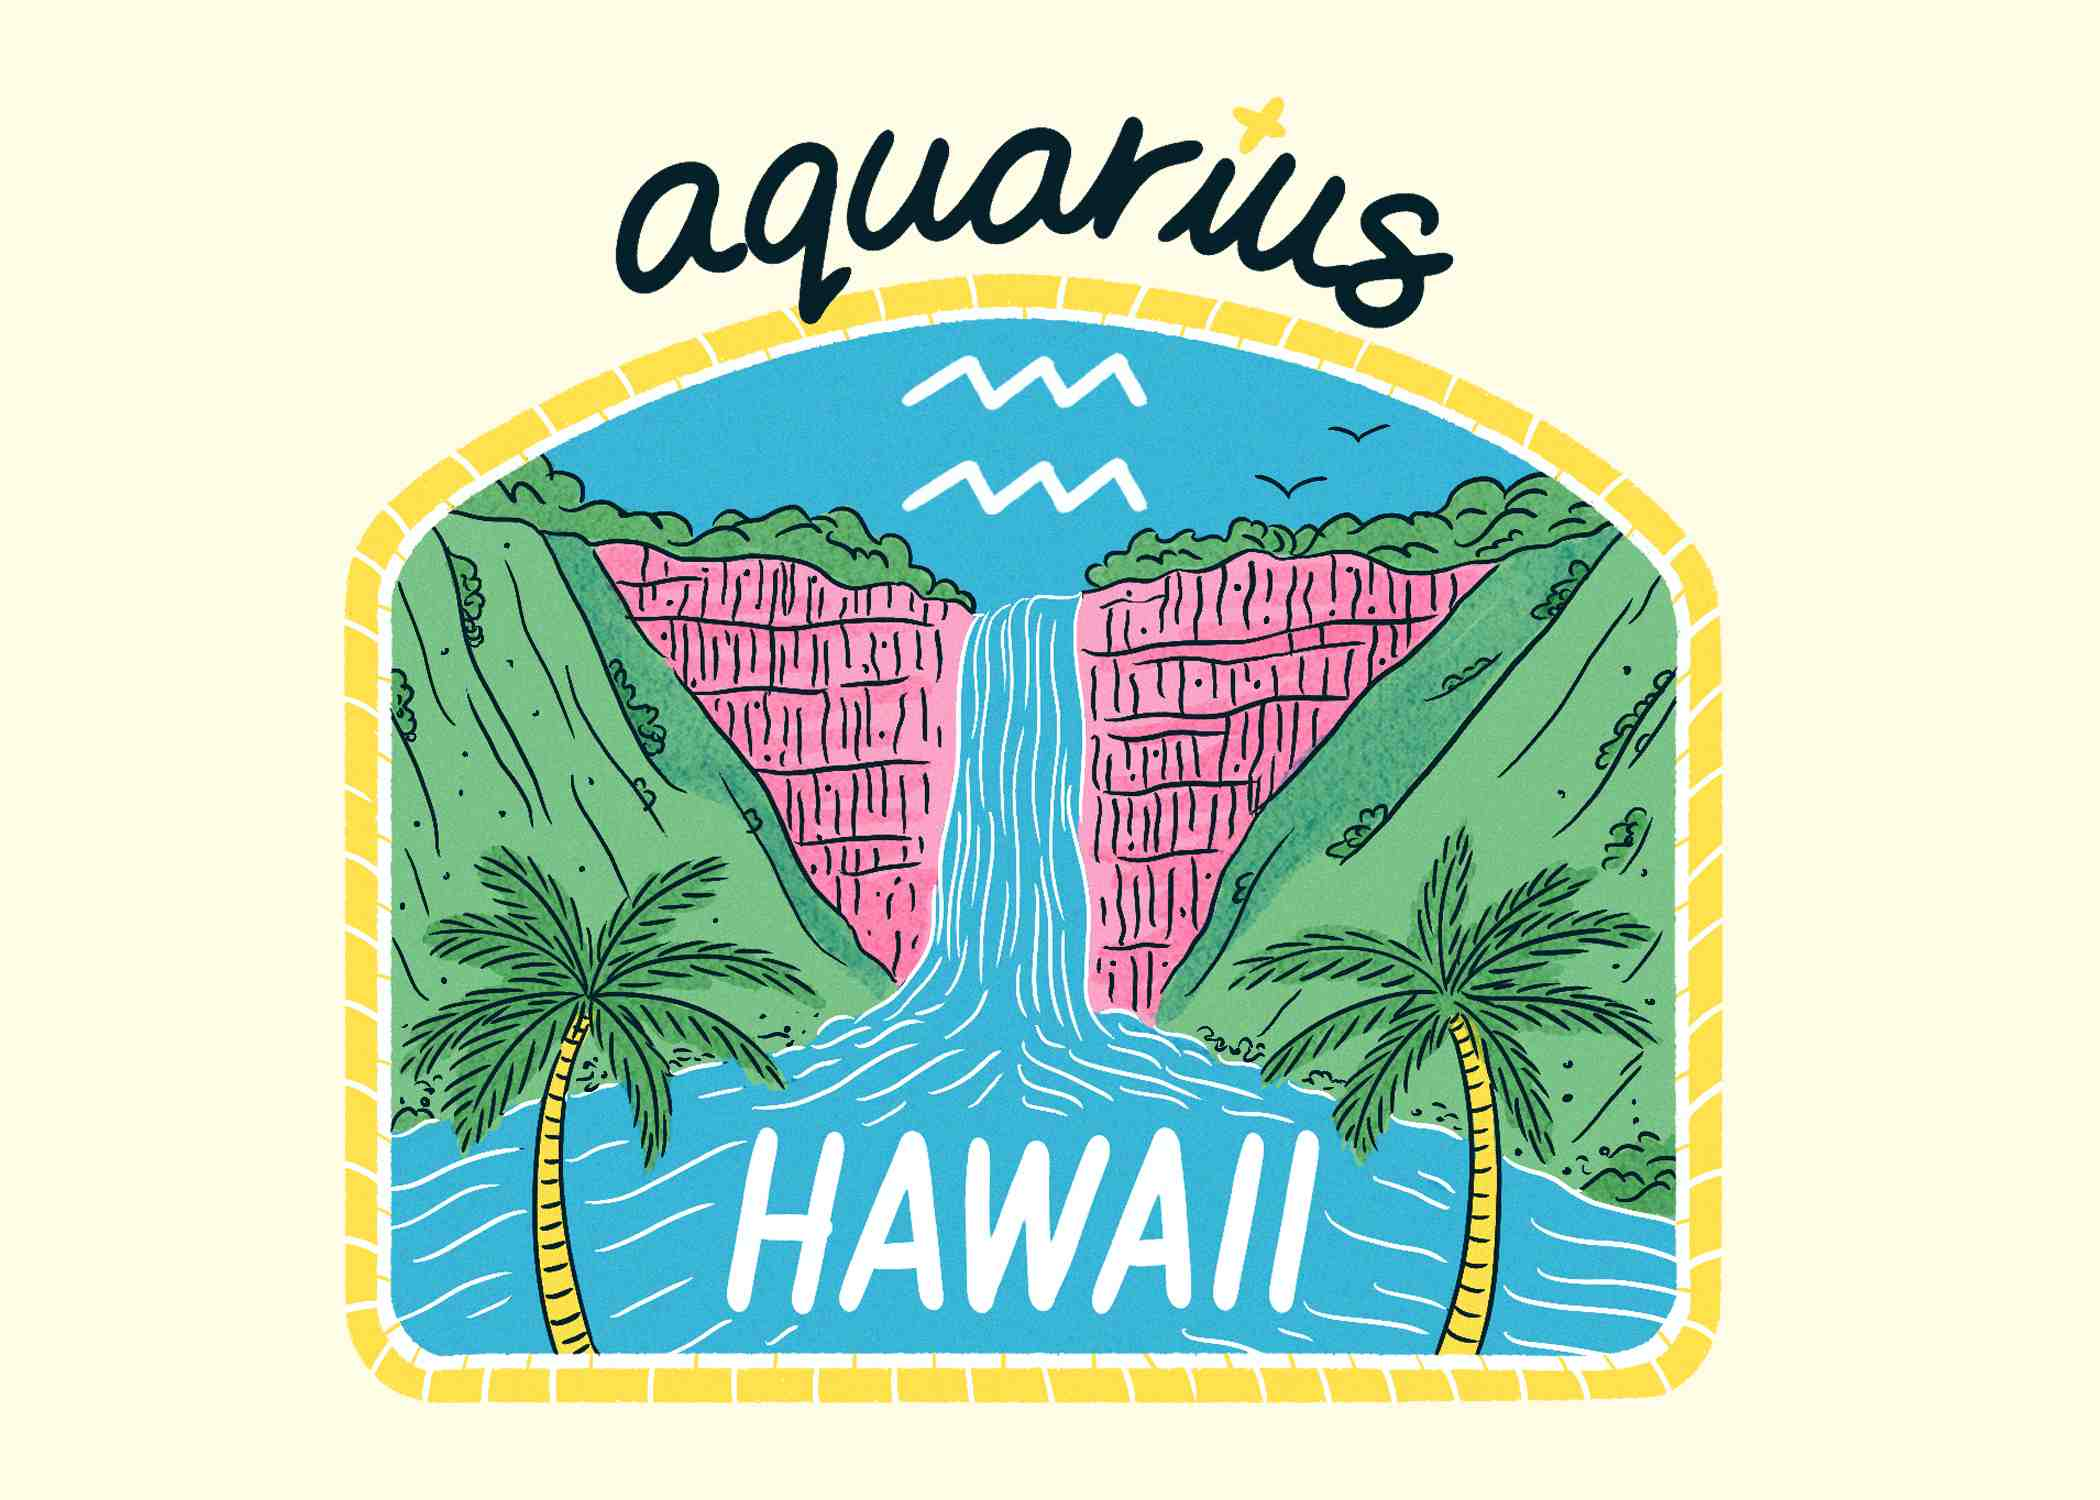 An illustration of Hawaii for Aquarius